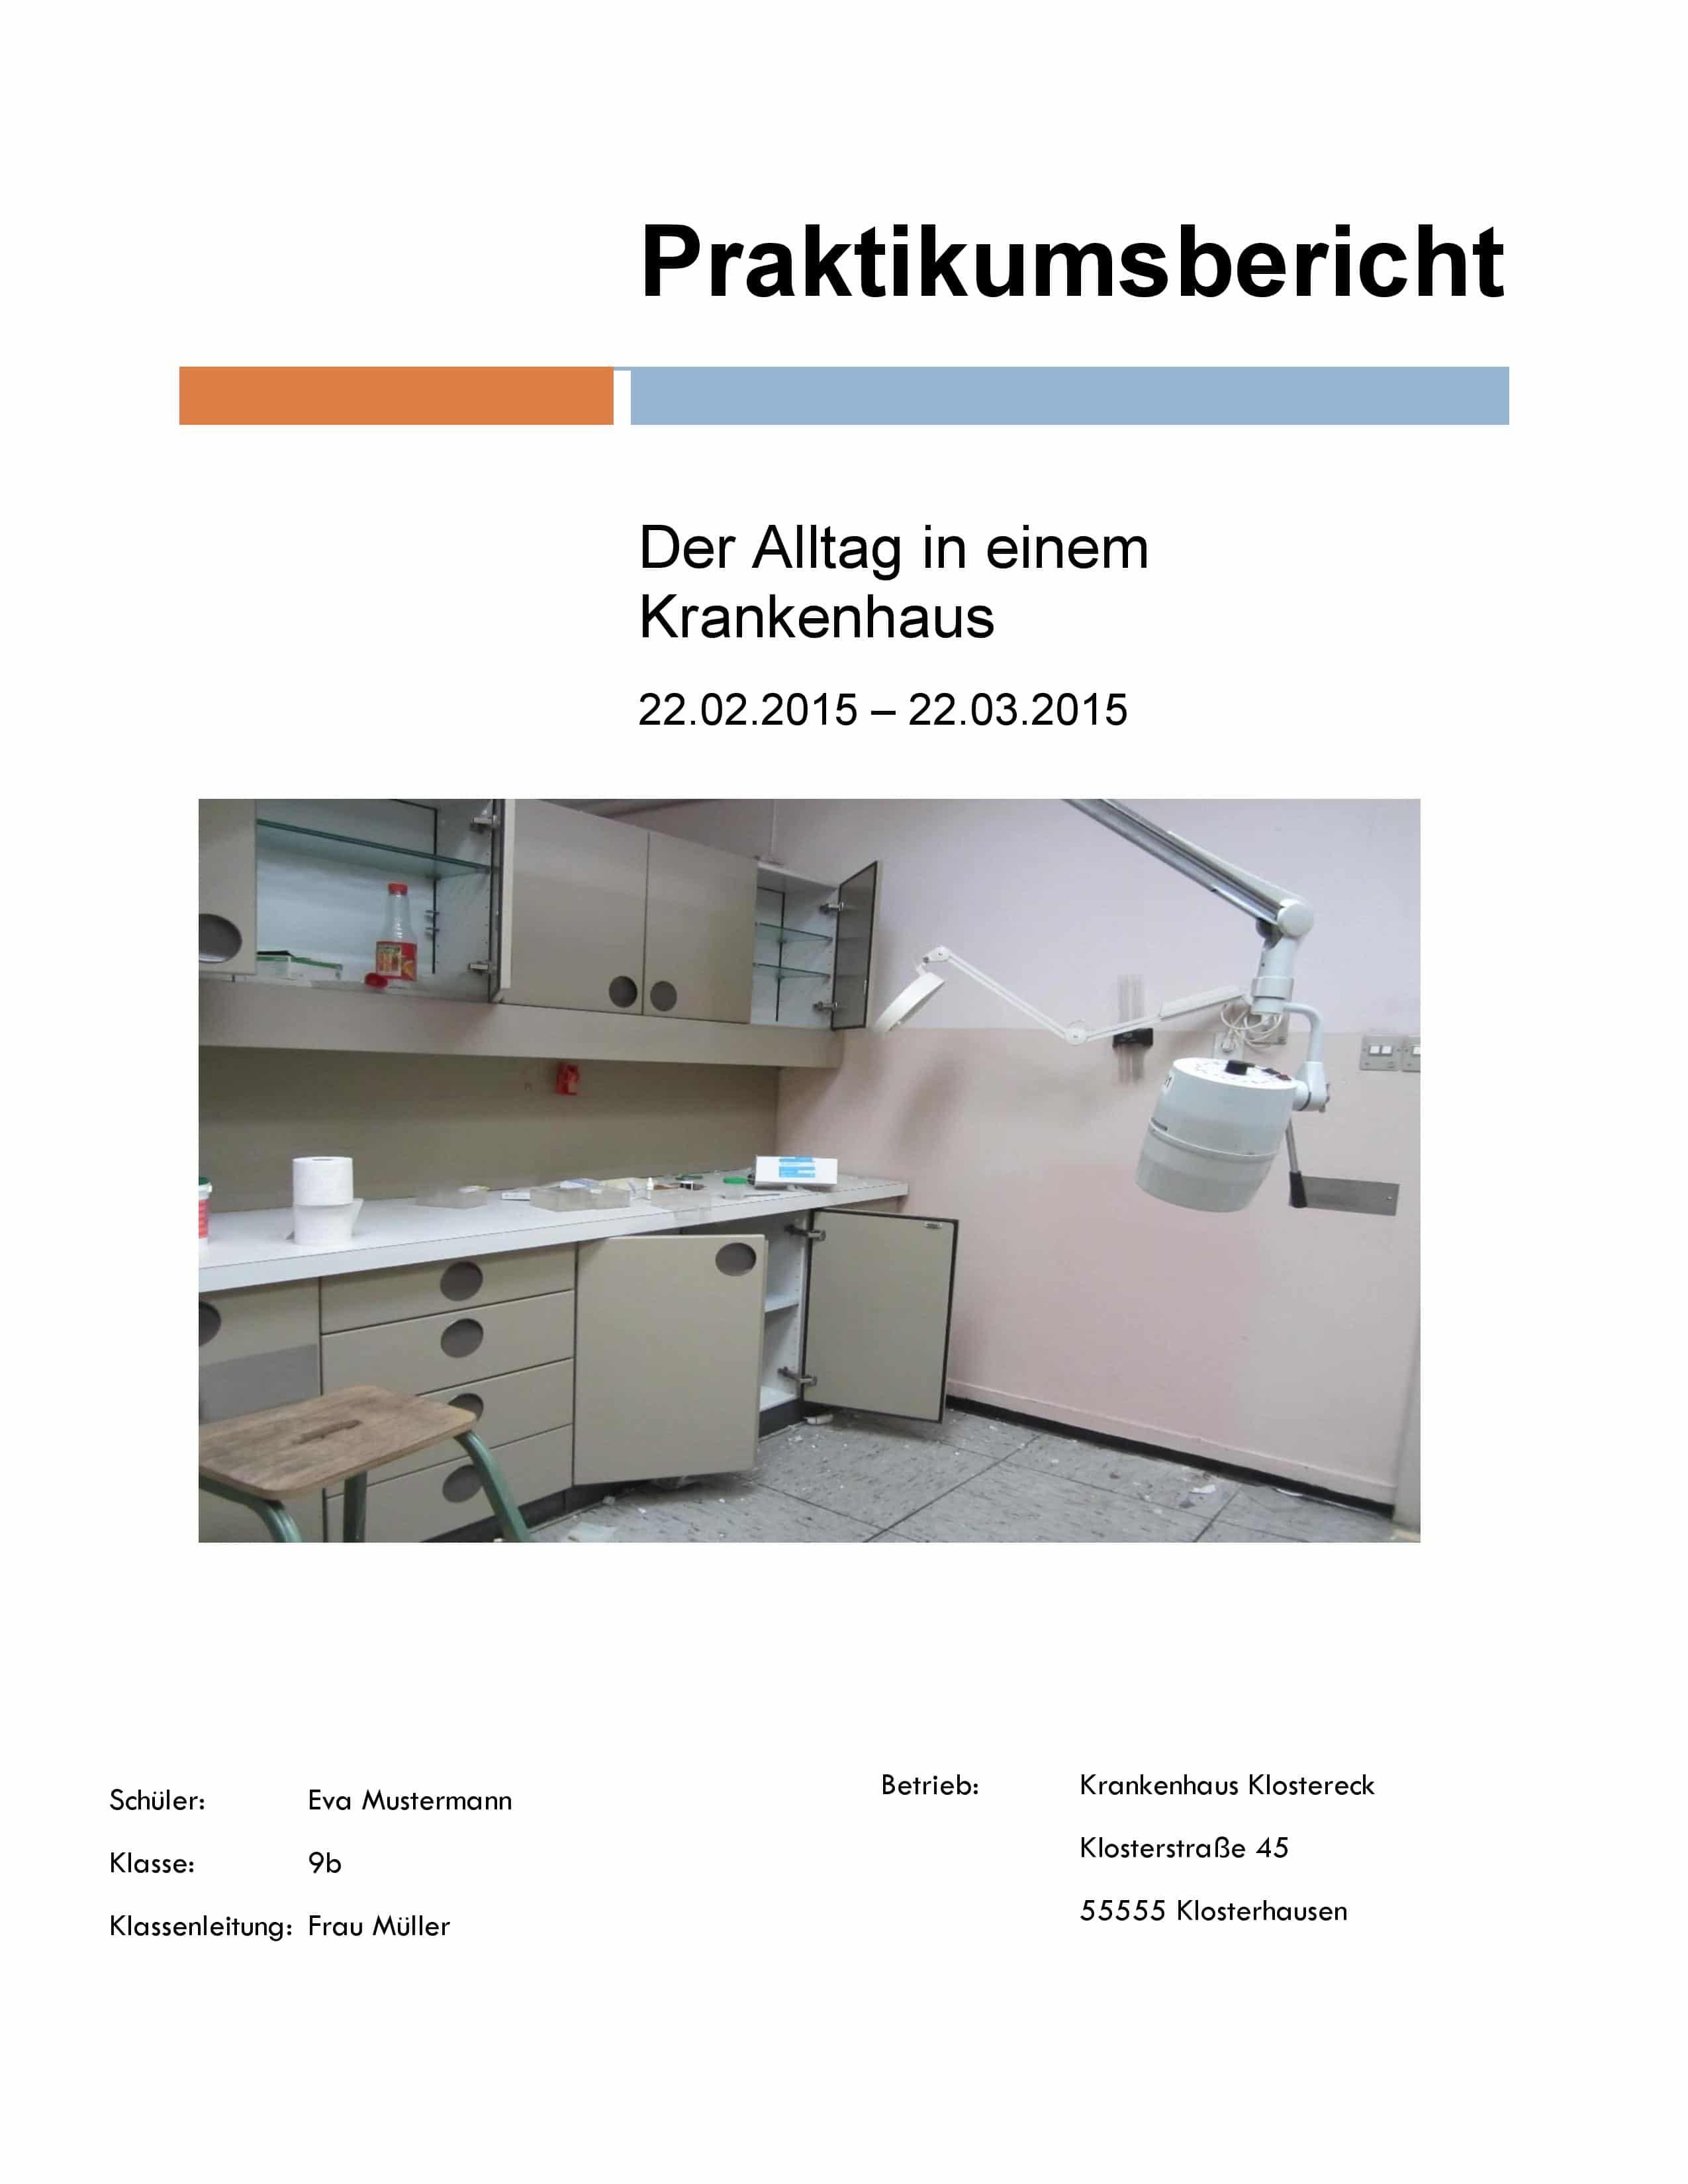 Praktikumsbericht Deckblatt Krankenhaus